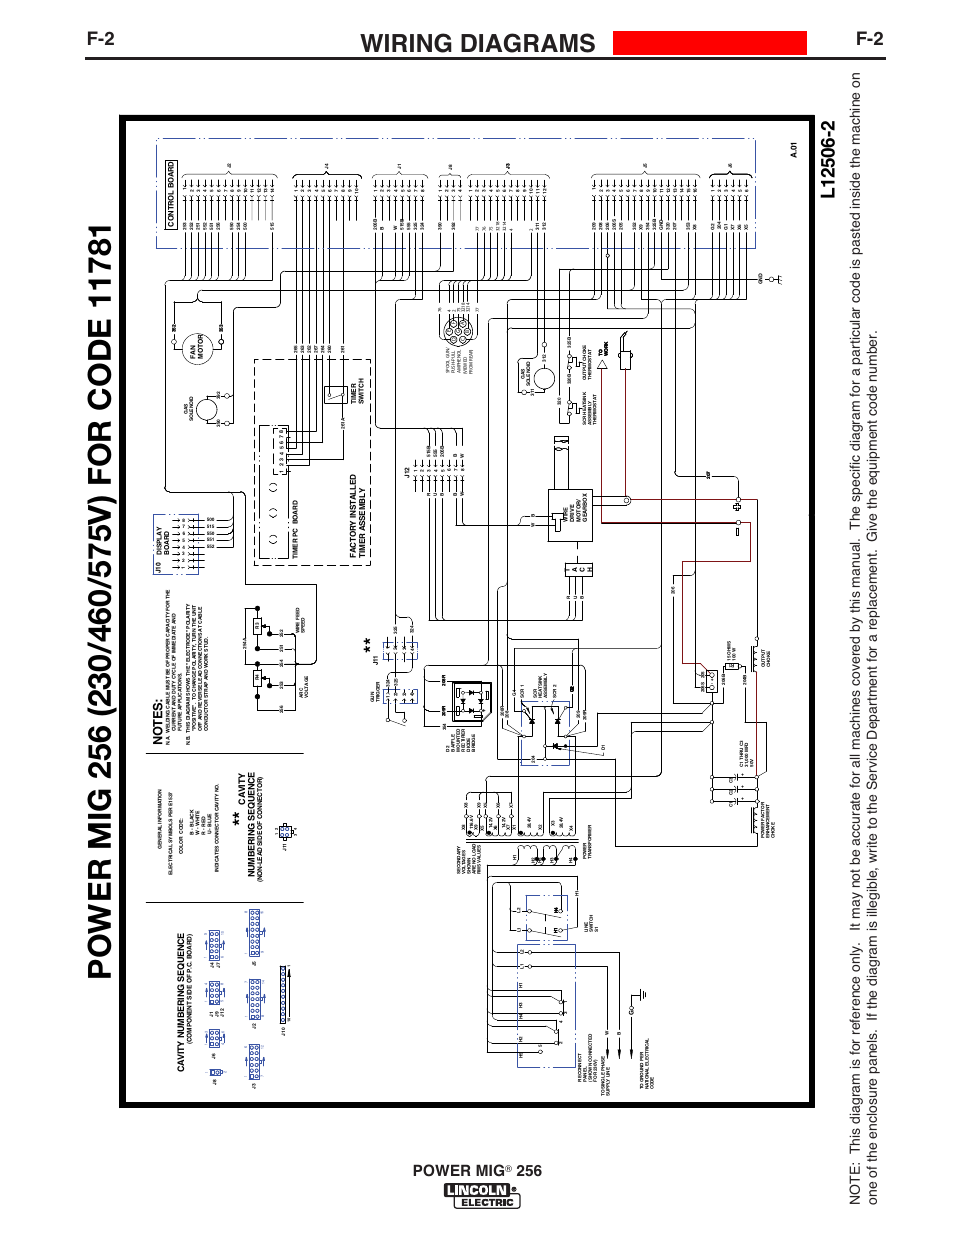 Wiring Diagrams  Enhanced Diagram  Power Mig